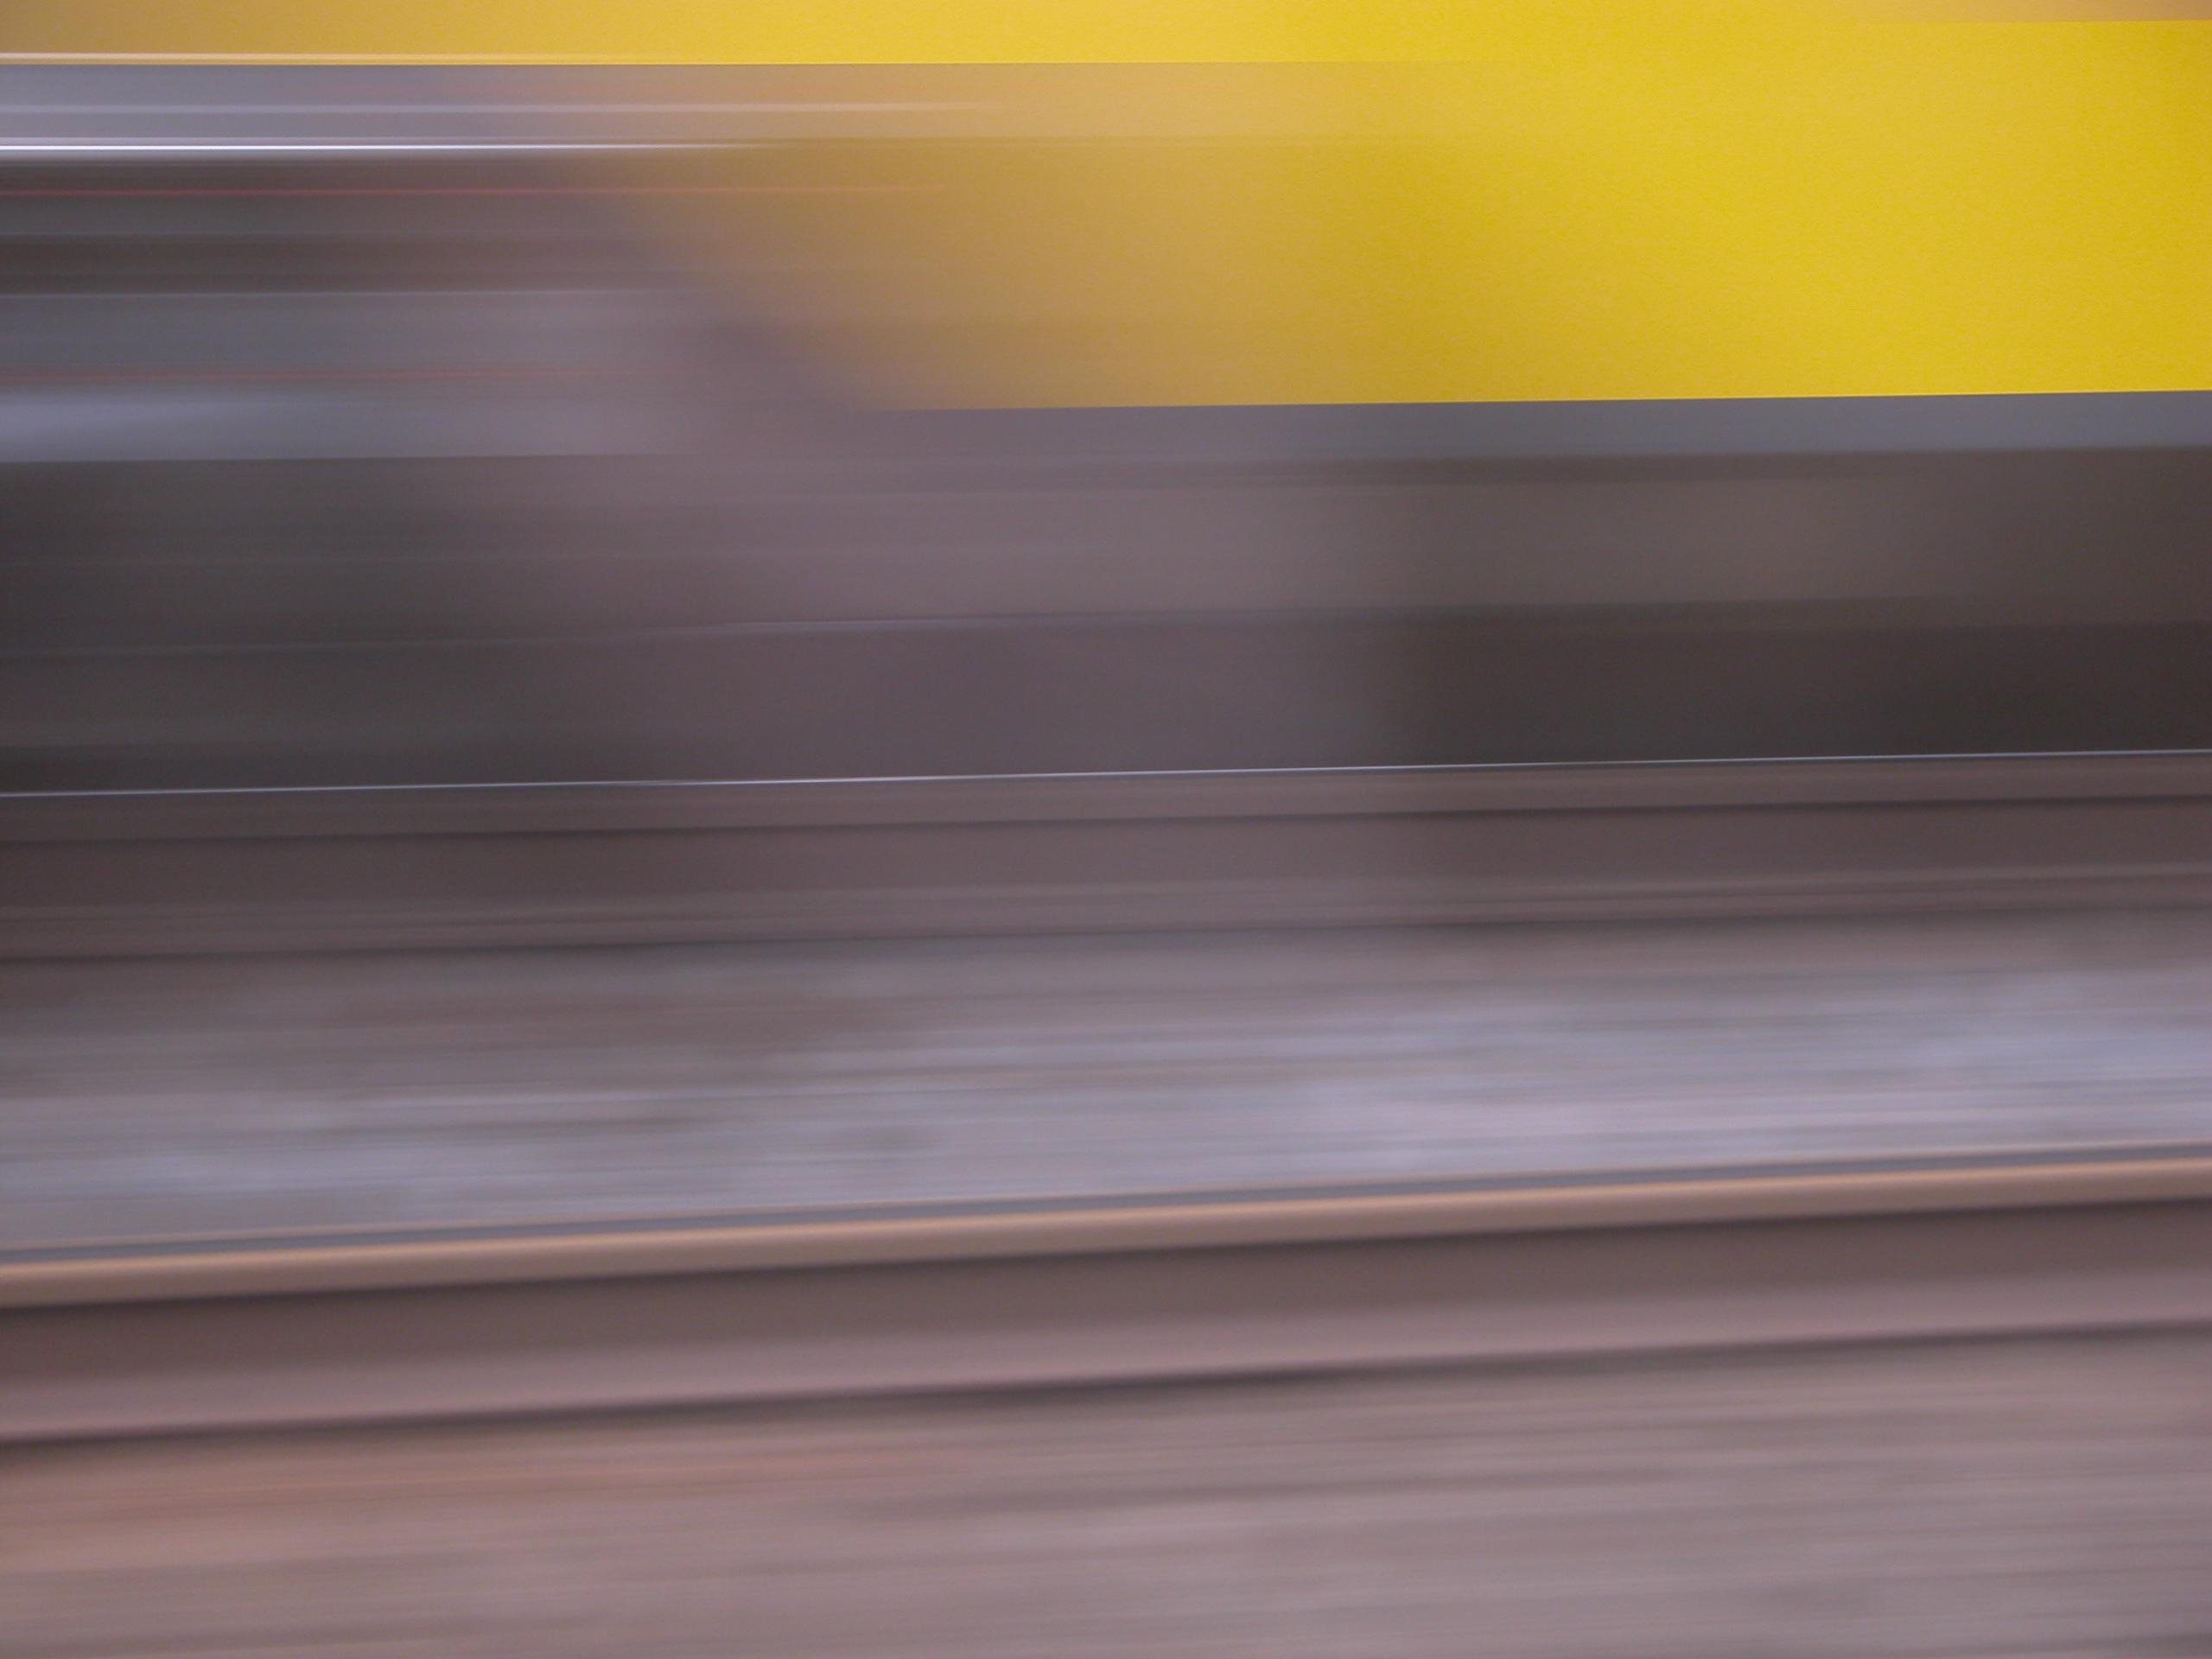 blurs blur moving speed speeding line lines train tracks